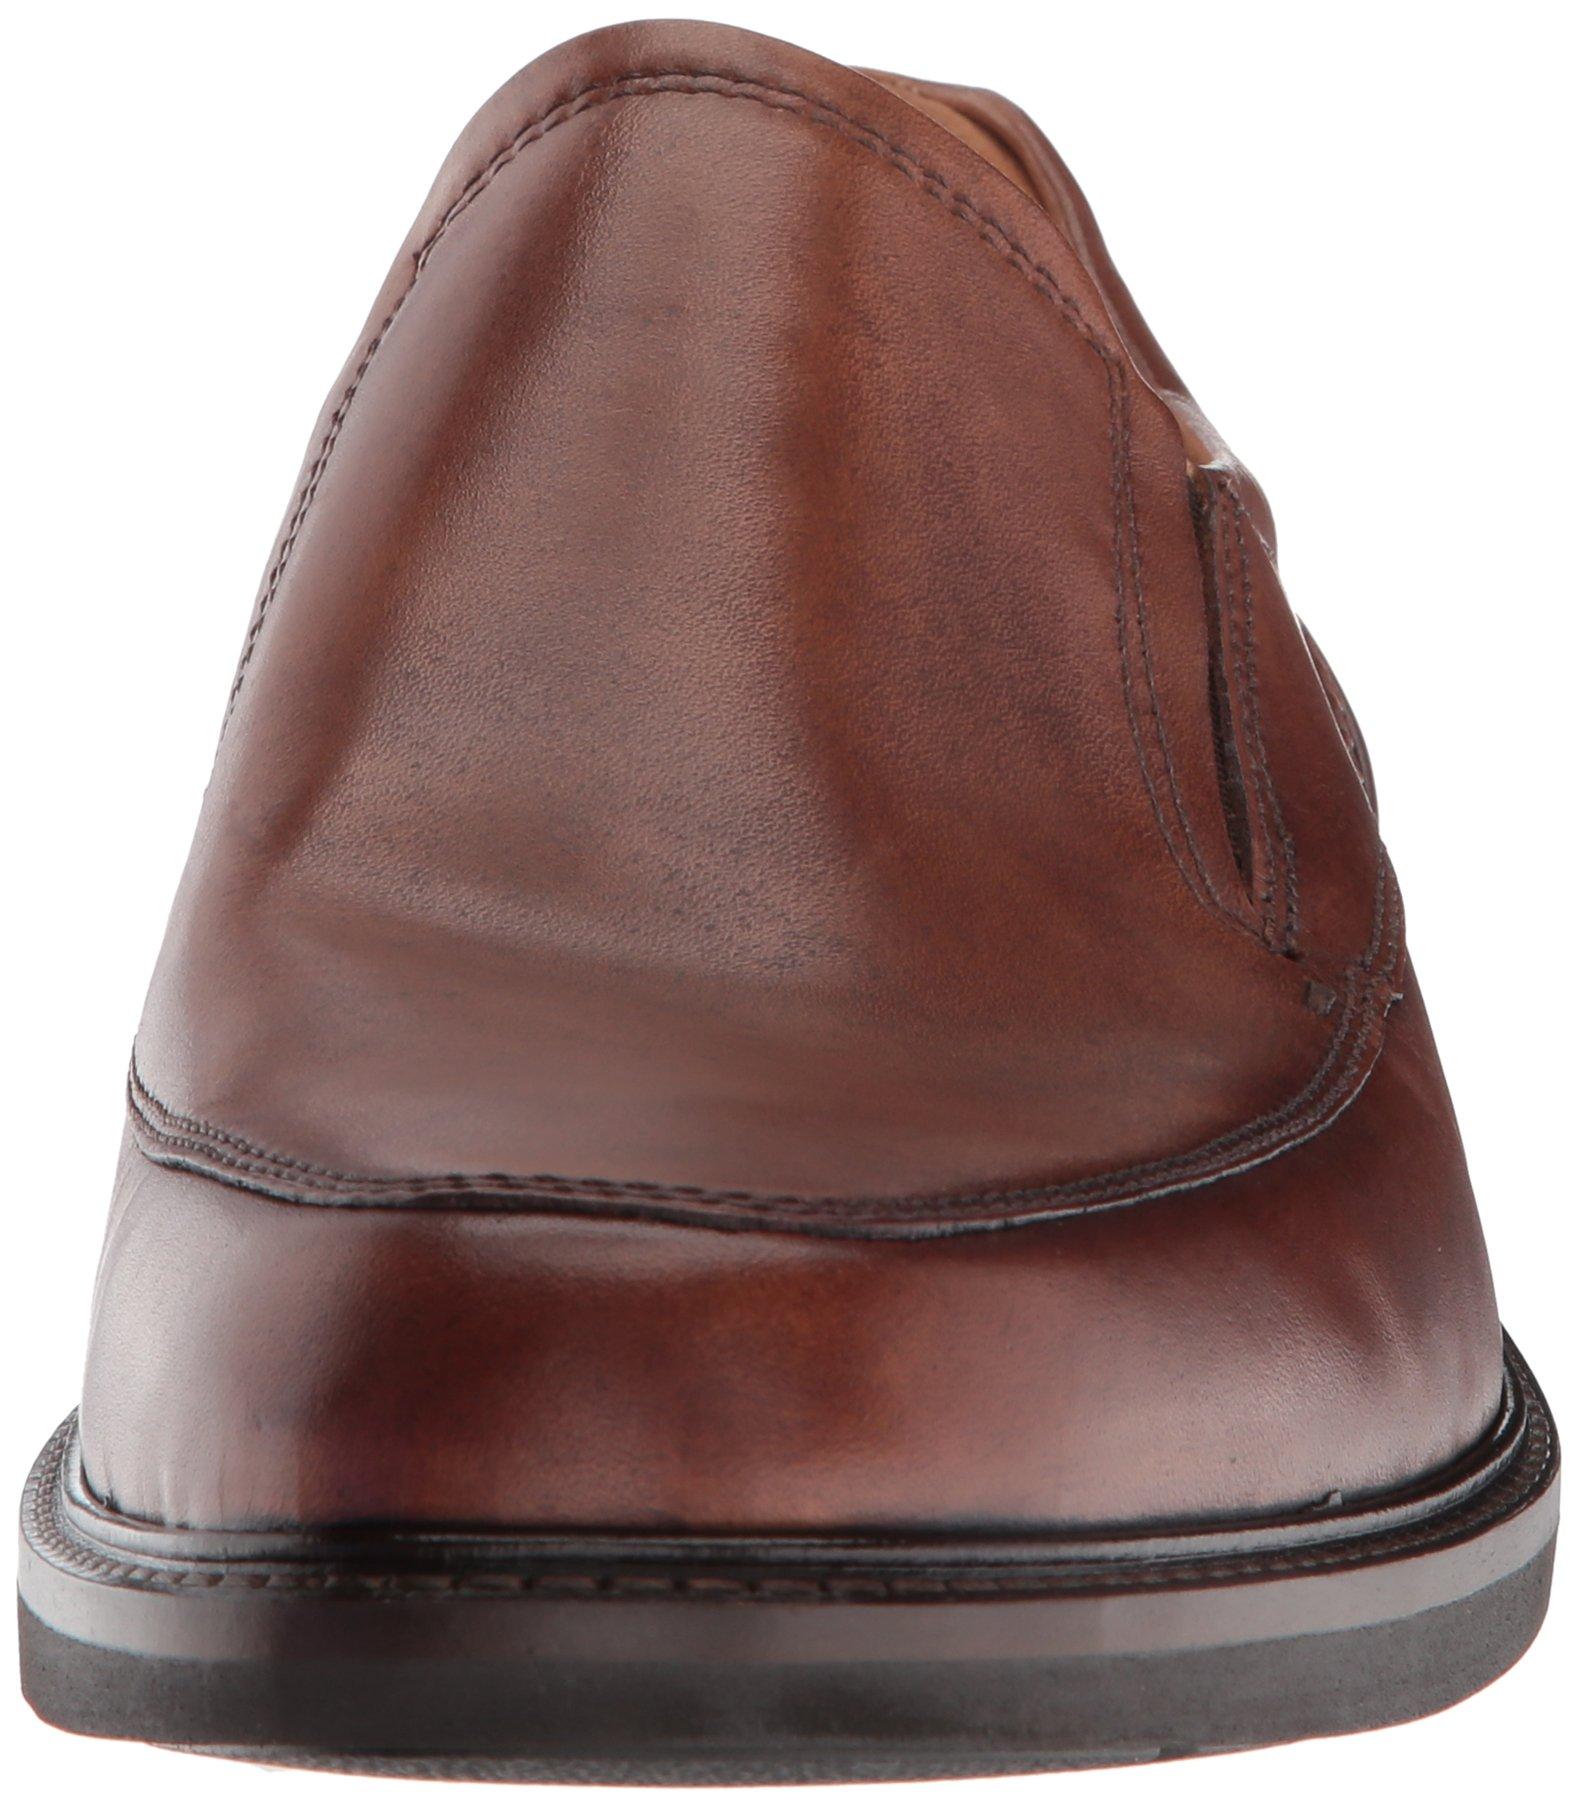 88f89a28e9a ECCO Men's Holton Apron Toe Slip On Loafer, Amber, 44 M EU (10-10.5 ...